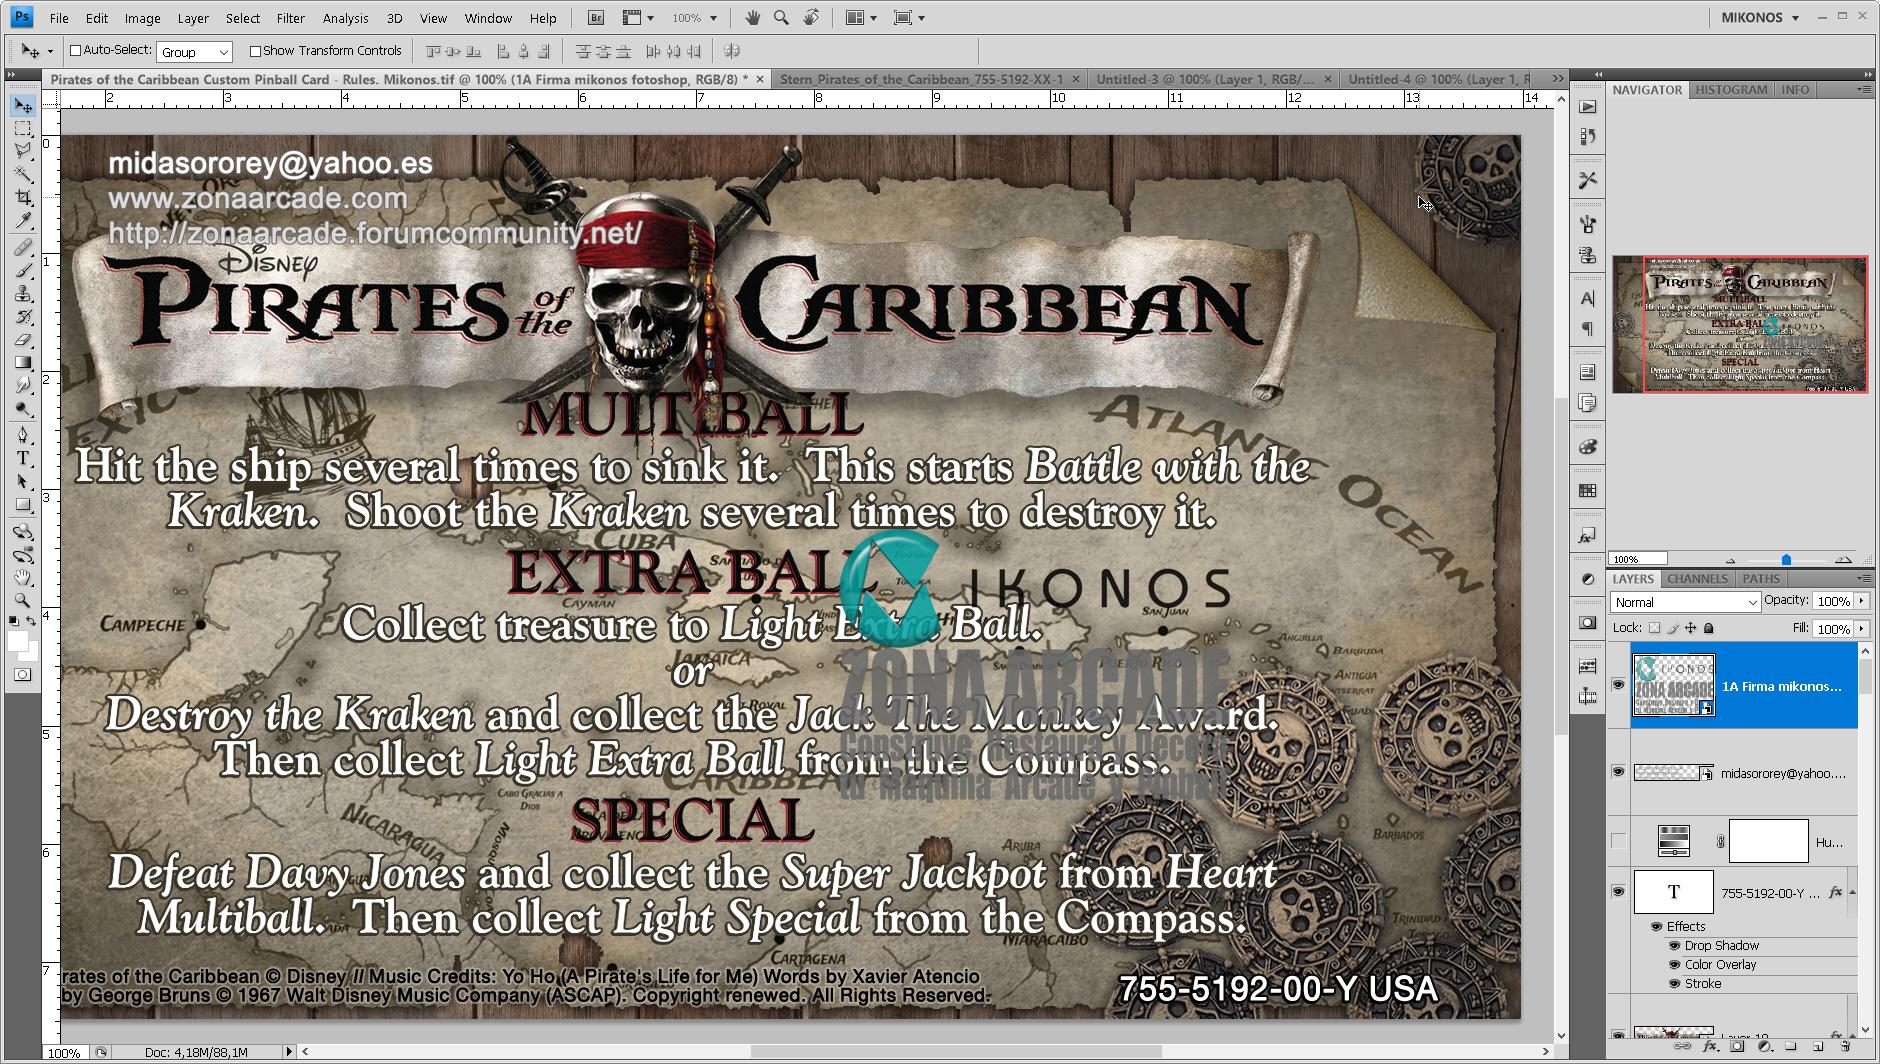 Pirates%20of%20the%20Caribbean%20Custom%20Pinball%20Card%20-%20Rules.%20Mikonos2.jpg